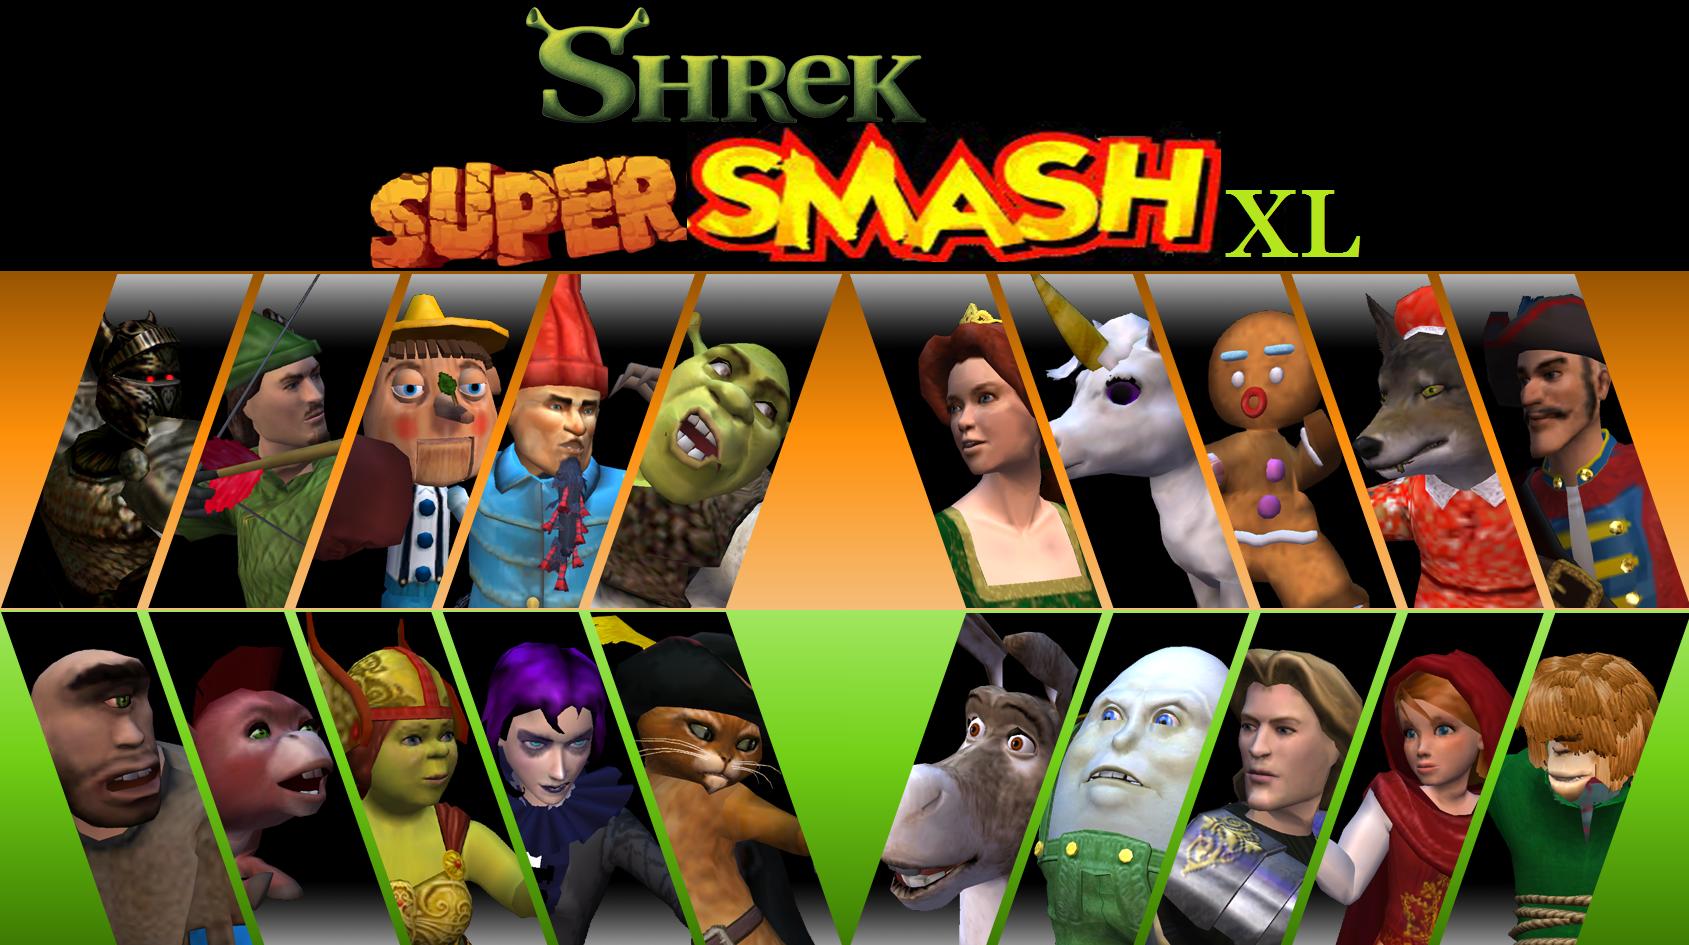 Shrek Super Smash XL